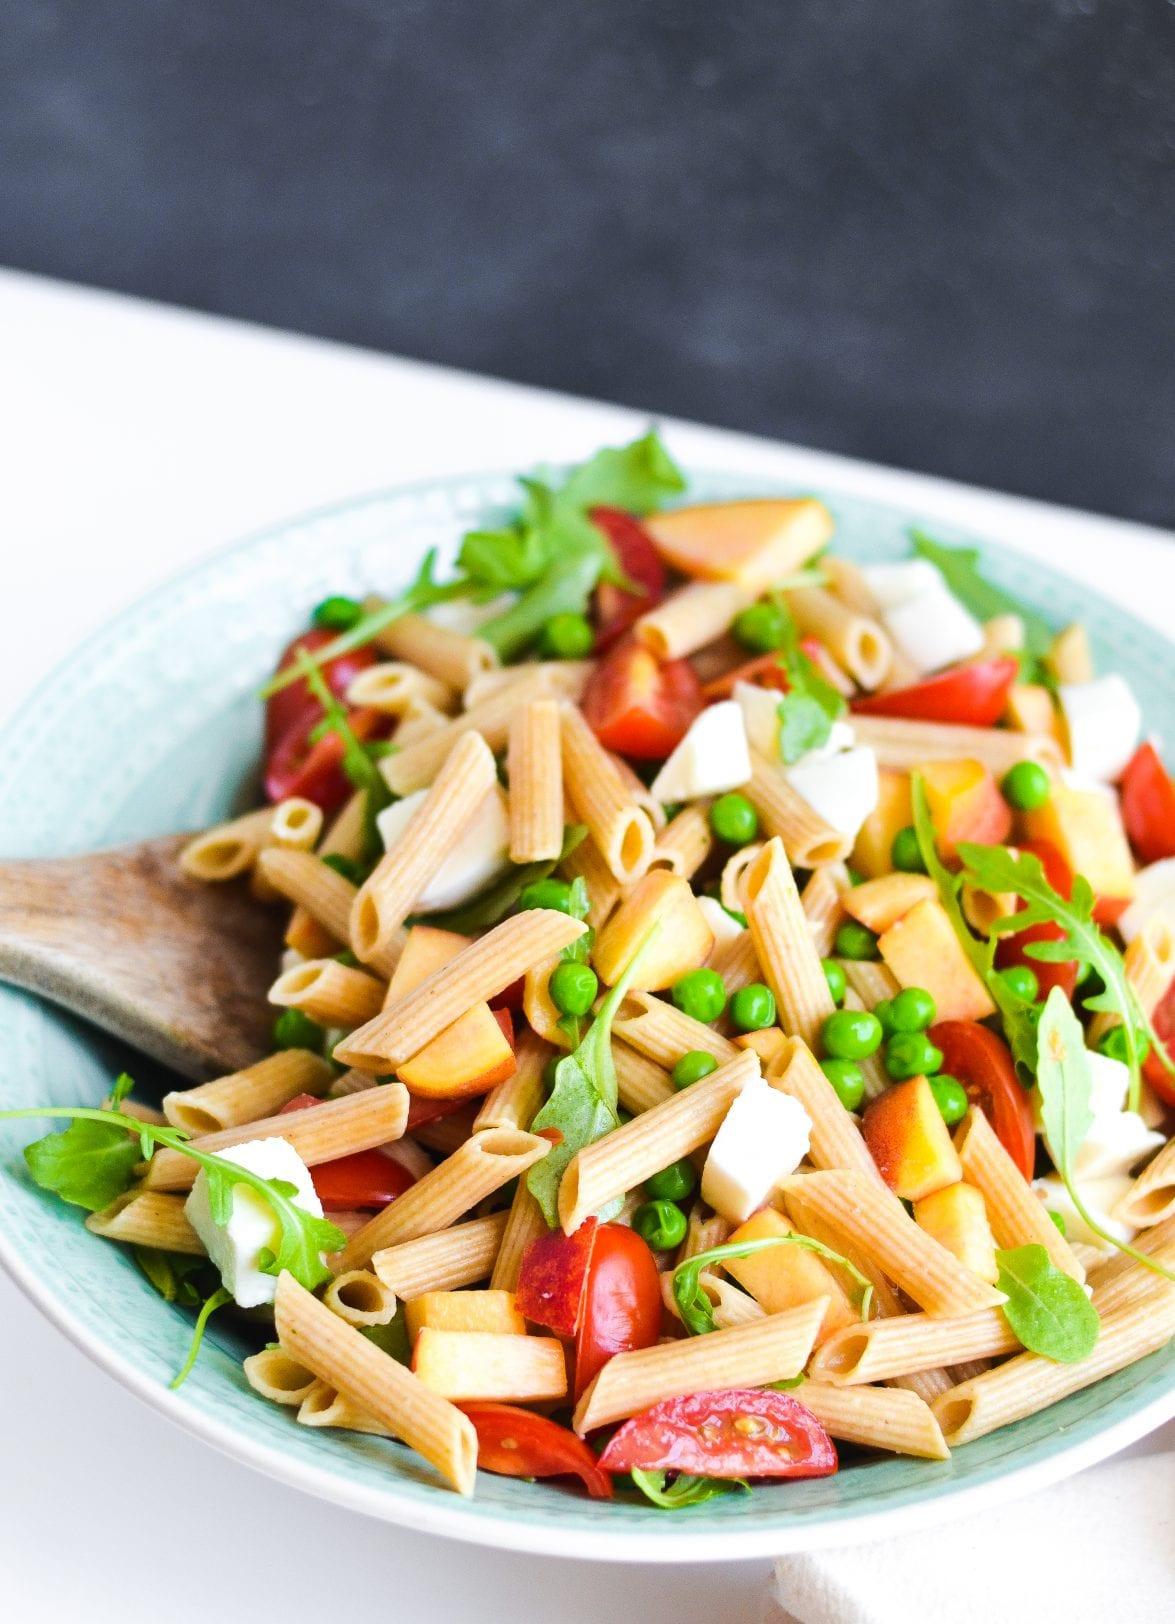 Spring Pasta Salad with Basil Vinaigrette